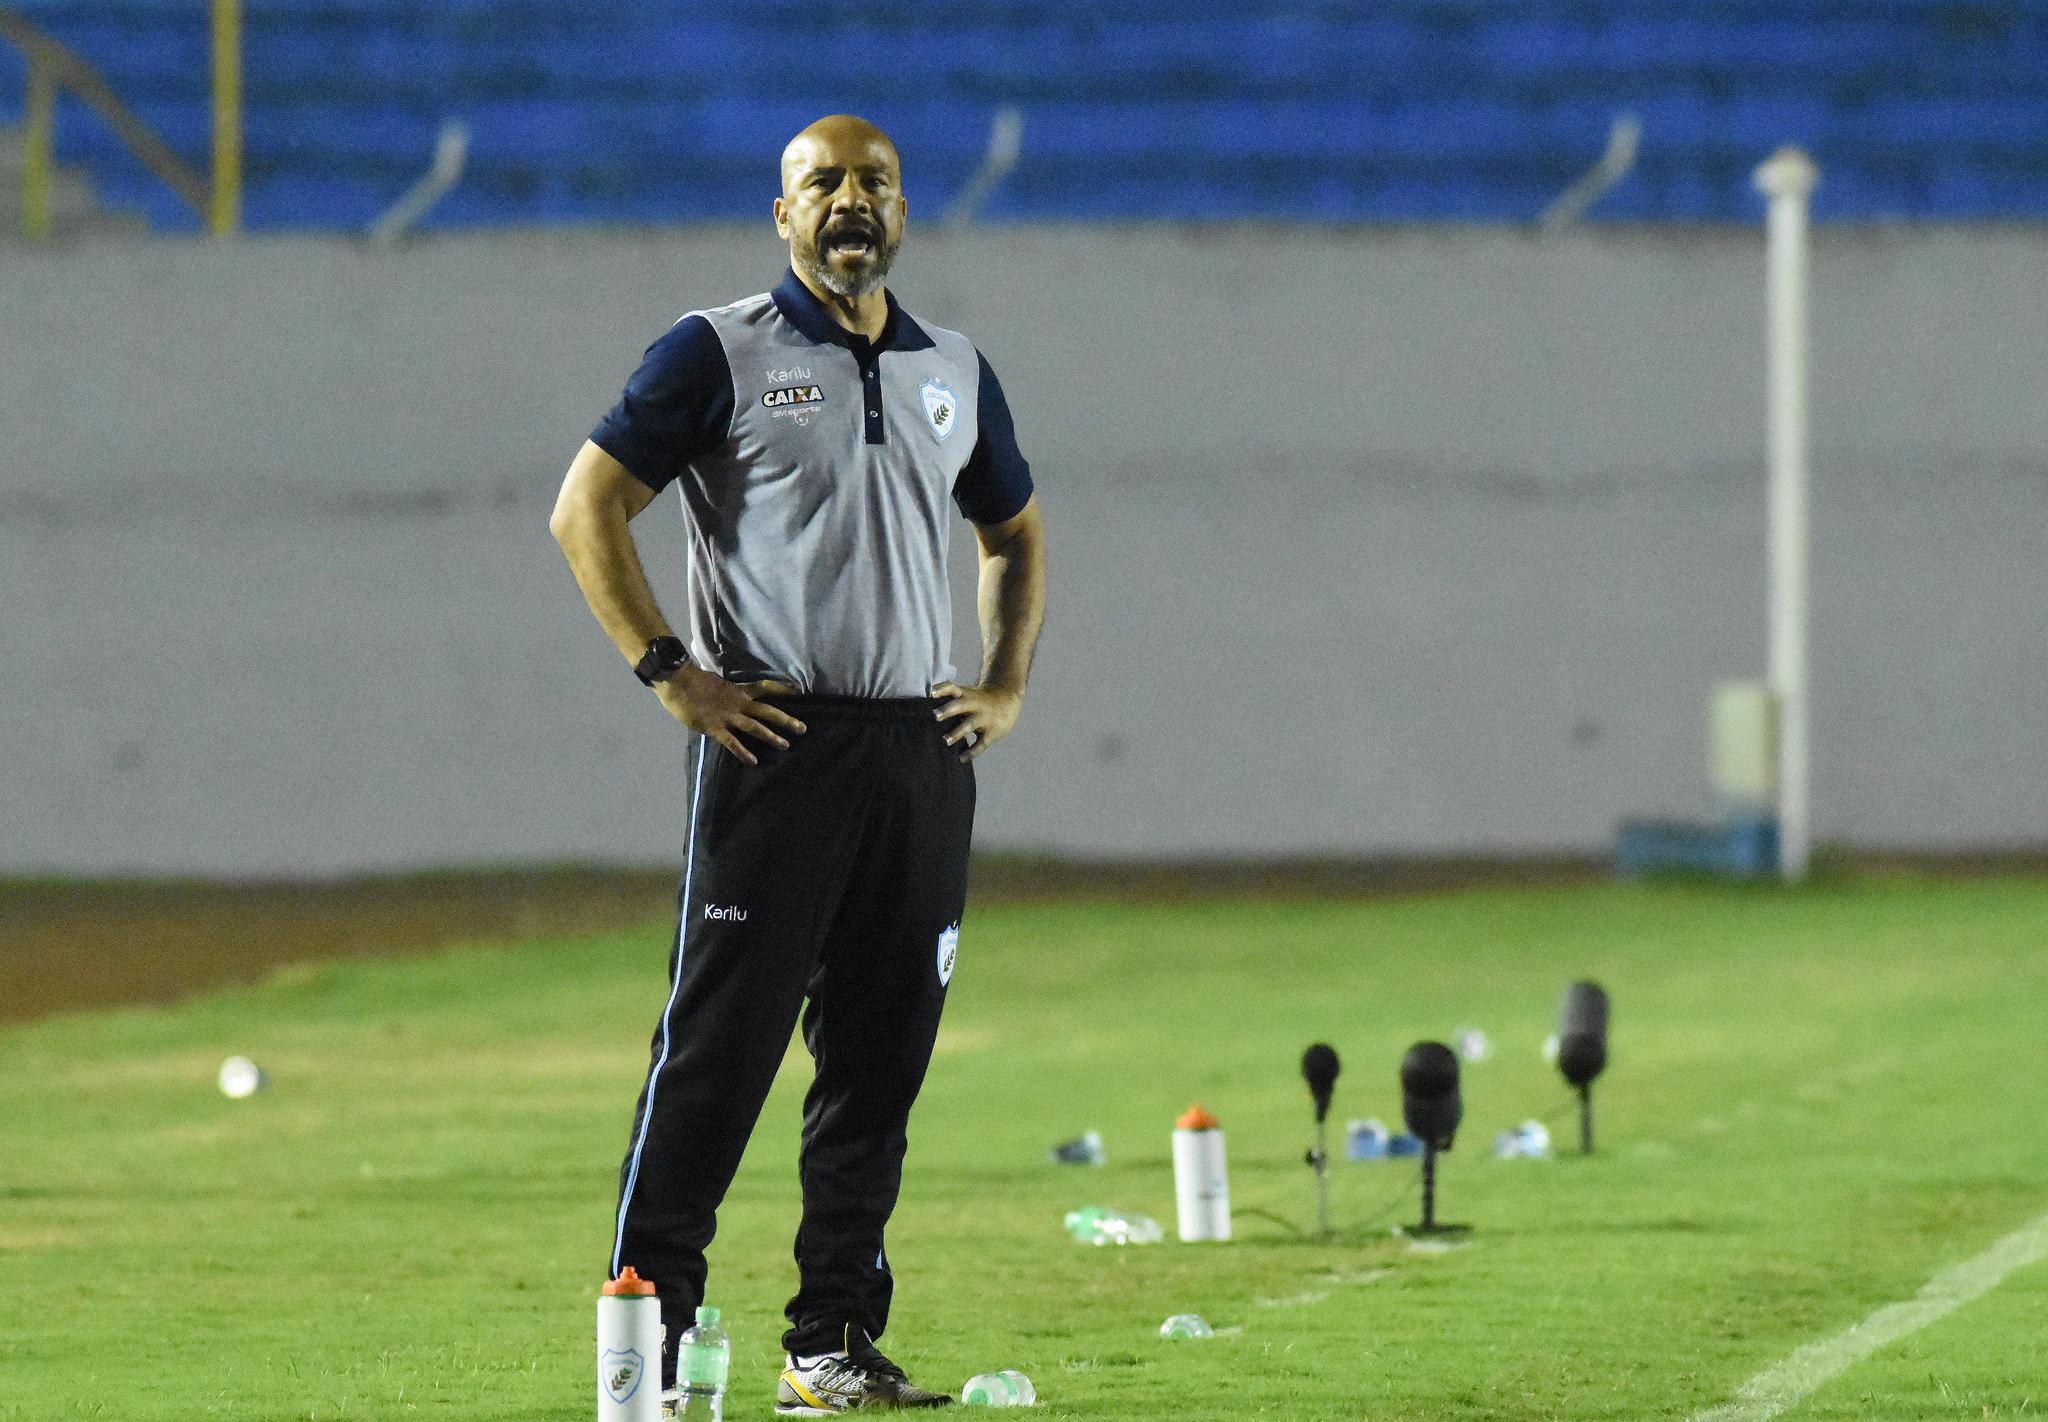 Sérgio Soares LEC Foto: Gustavo Oliveira/Londrina Esporte Clube